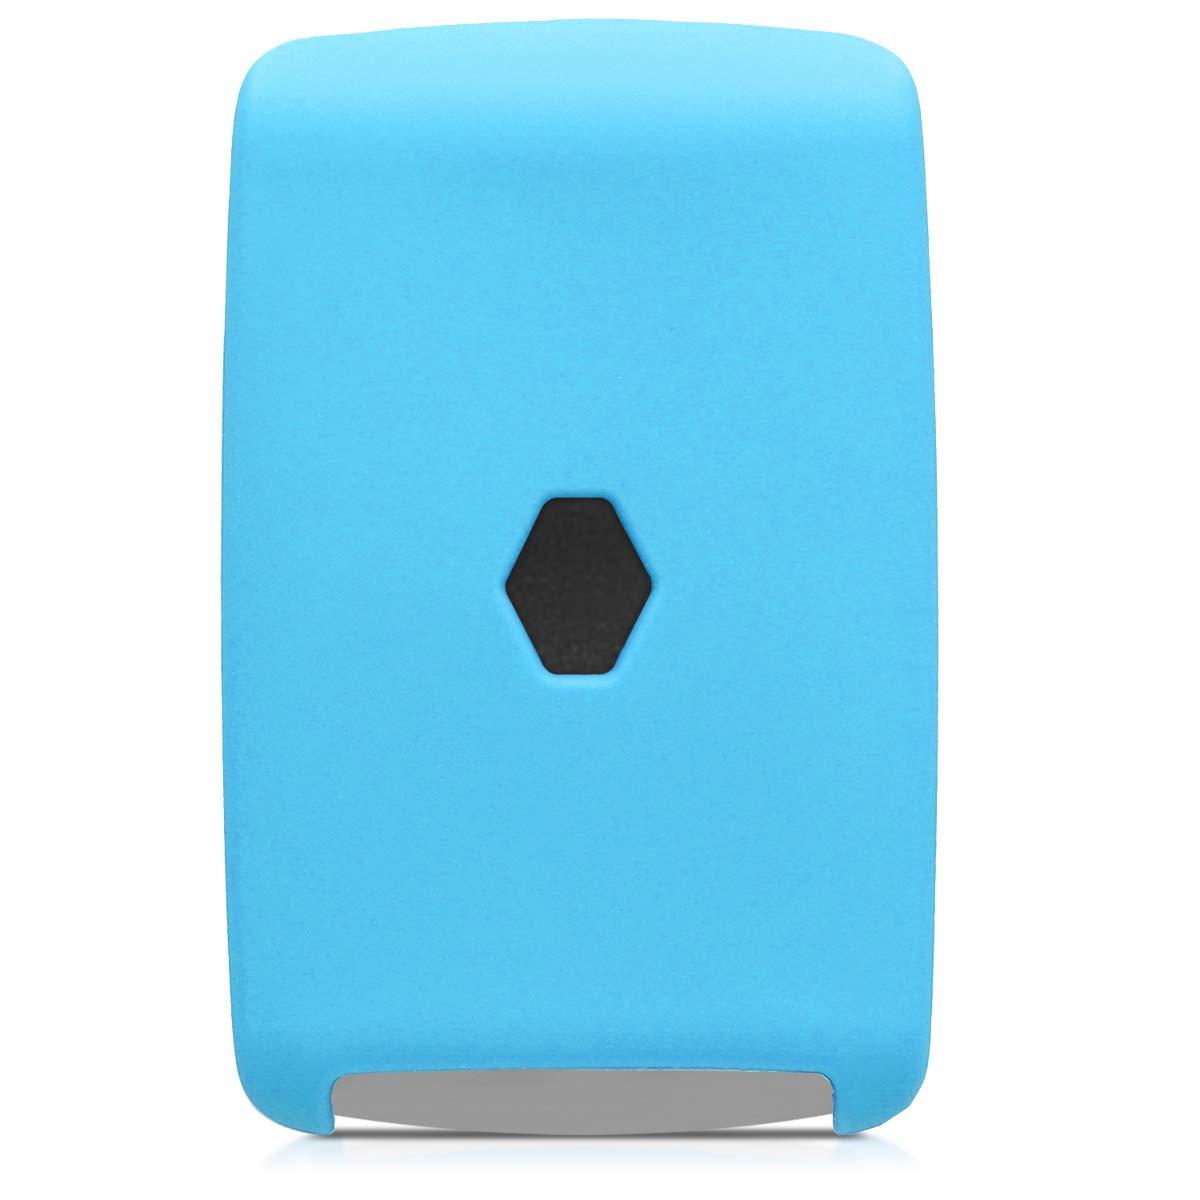 kwmobile Funda de Silicona para Llave Smart Key de 4 Botones para Coche Renault Solamente Keyless Go Silicona Naranja - Case Mando de Auto - Carcasa Protectora de Suave